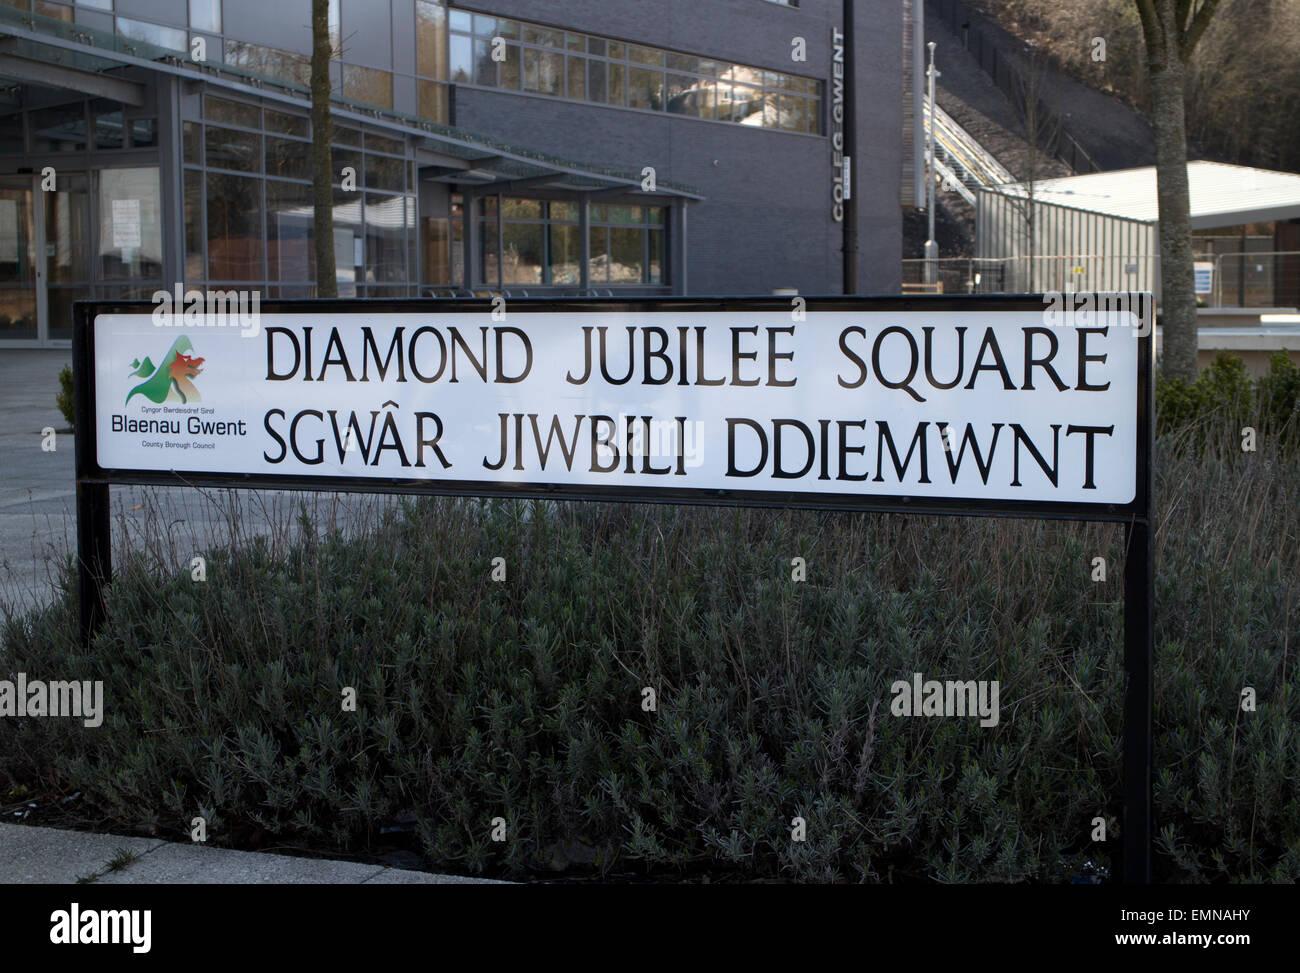 Bilingual Diamond Jubilee Square sign, Ebbw Vale, Blaenau Gwent, Wales, UK - Stock Image